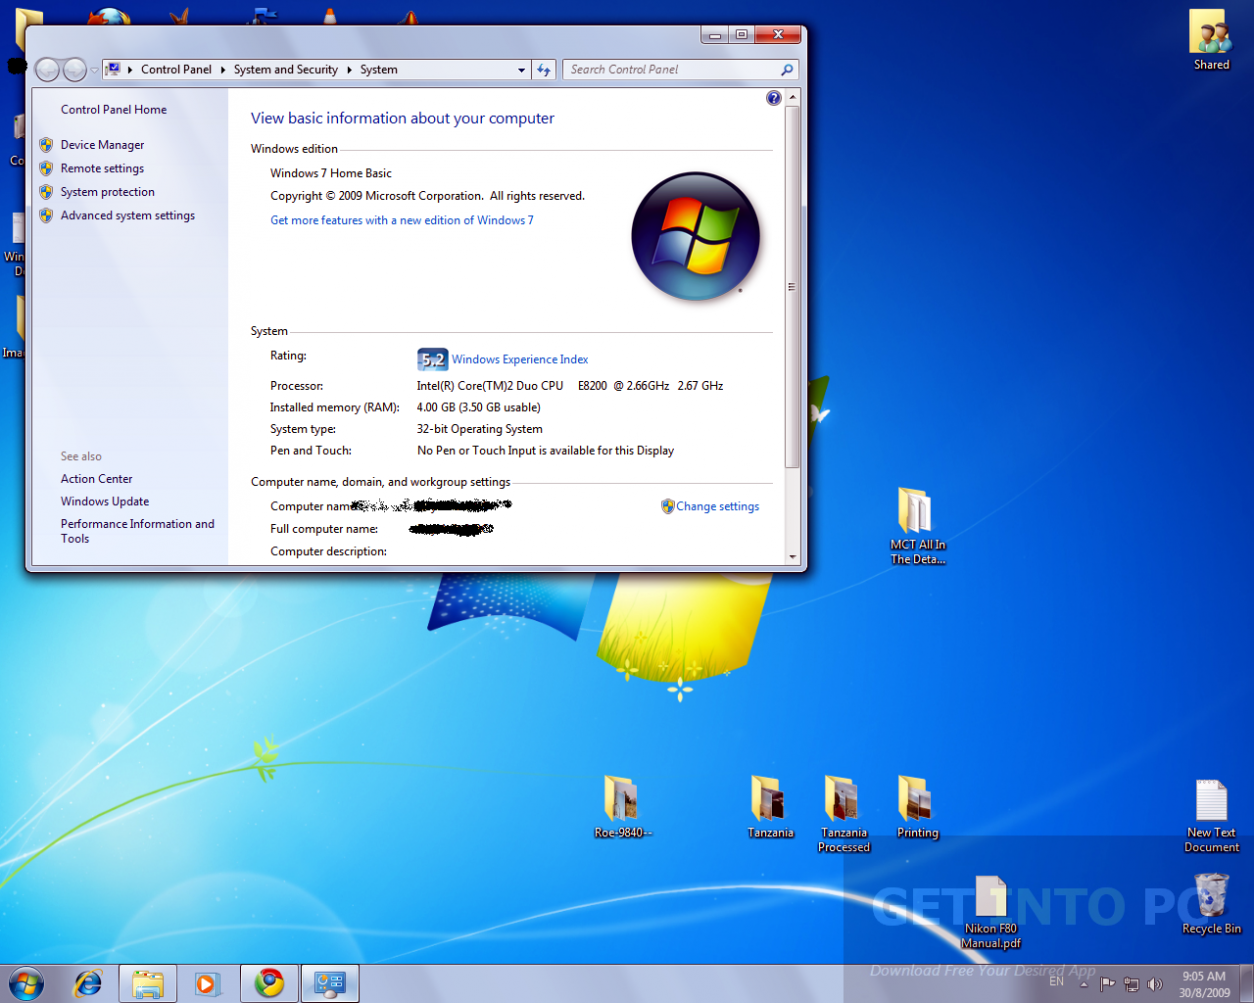 Windows 7 Home Basic ISO 32 Bit 64 Bit Free Download - Get